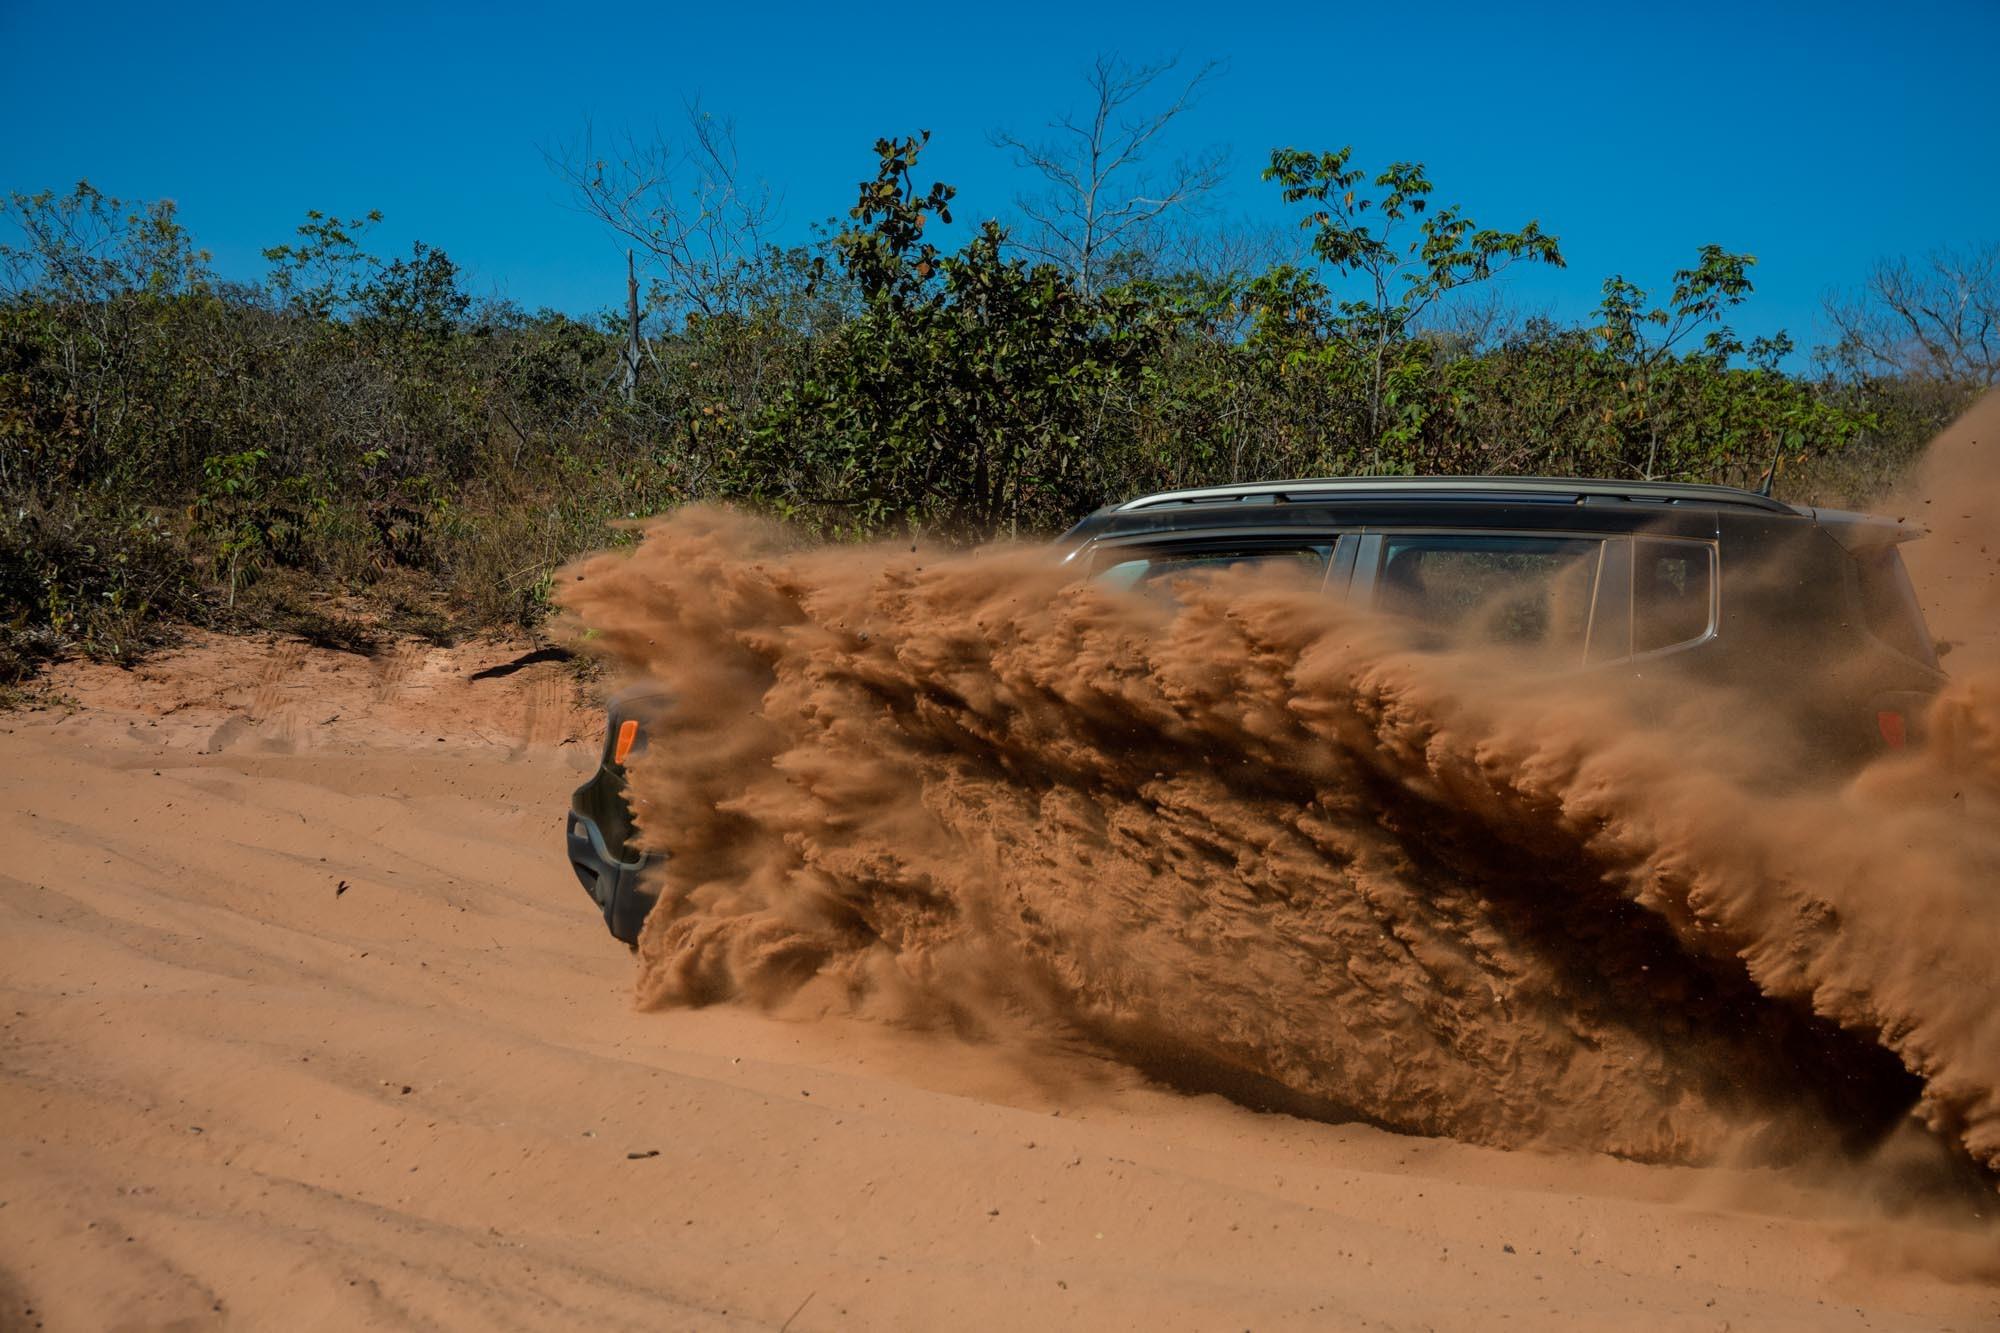 Sacode a poeira, dá a volta por cima (Foto: Marcos Camargo)